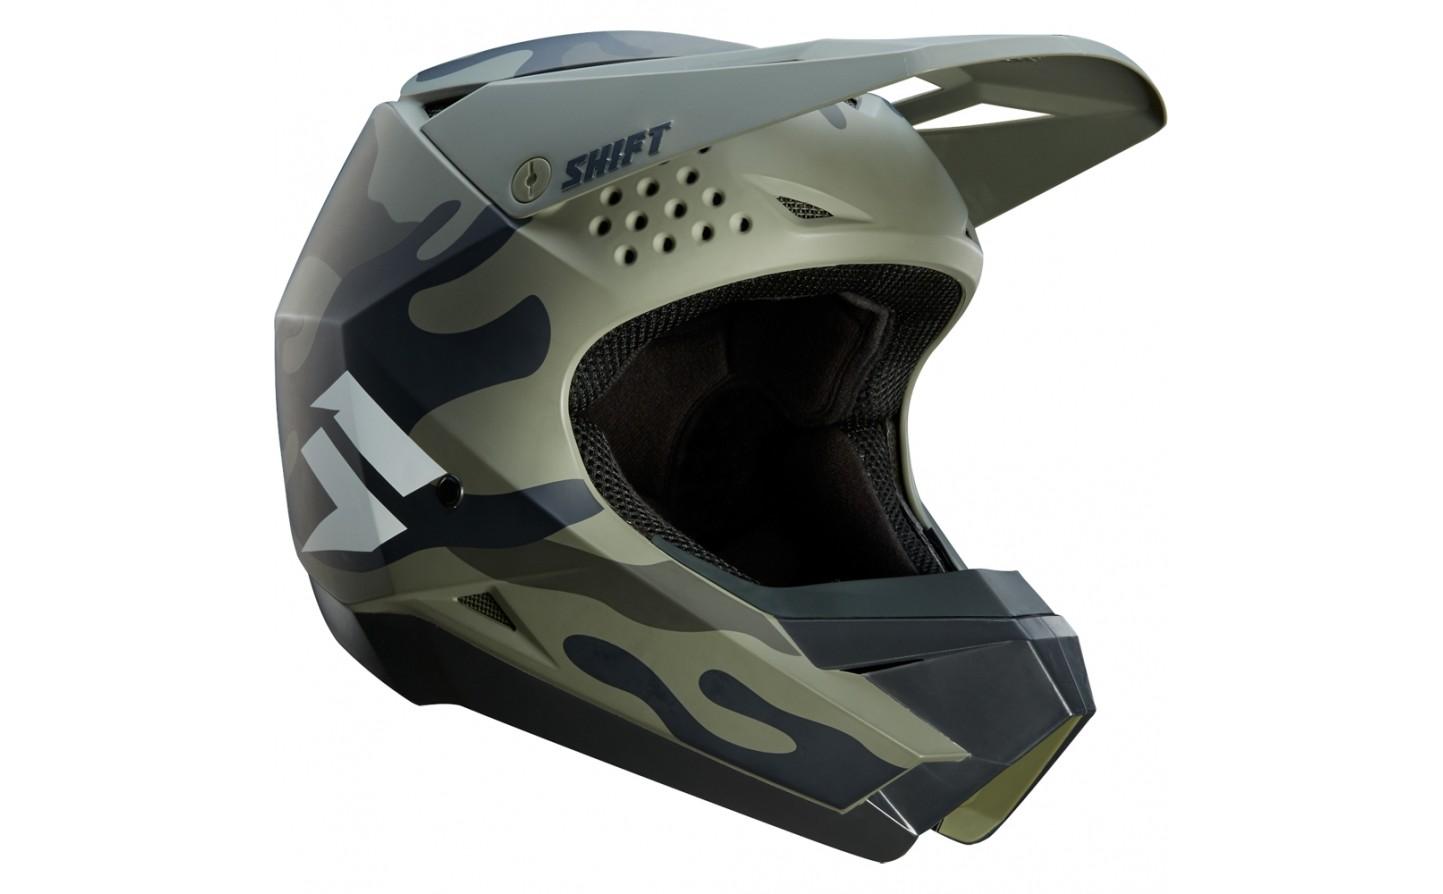 casco shift whit3 camo talle l (59-60cm)